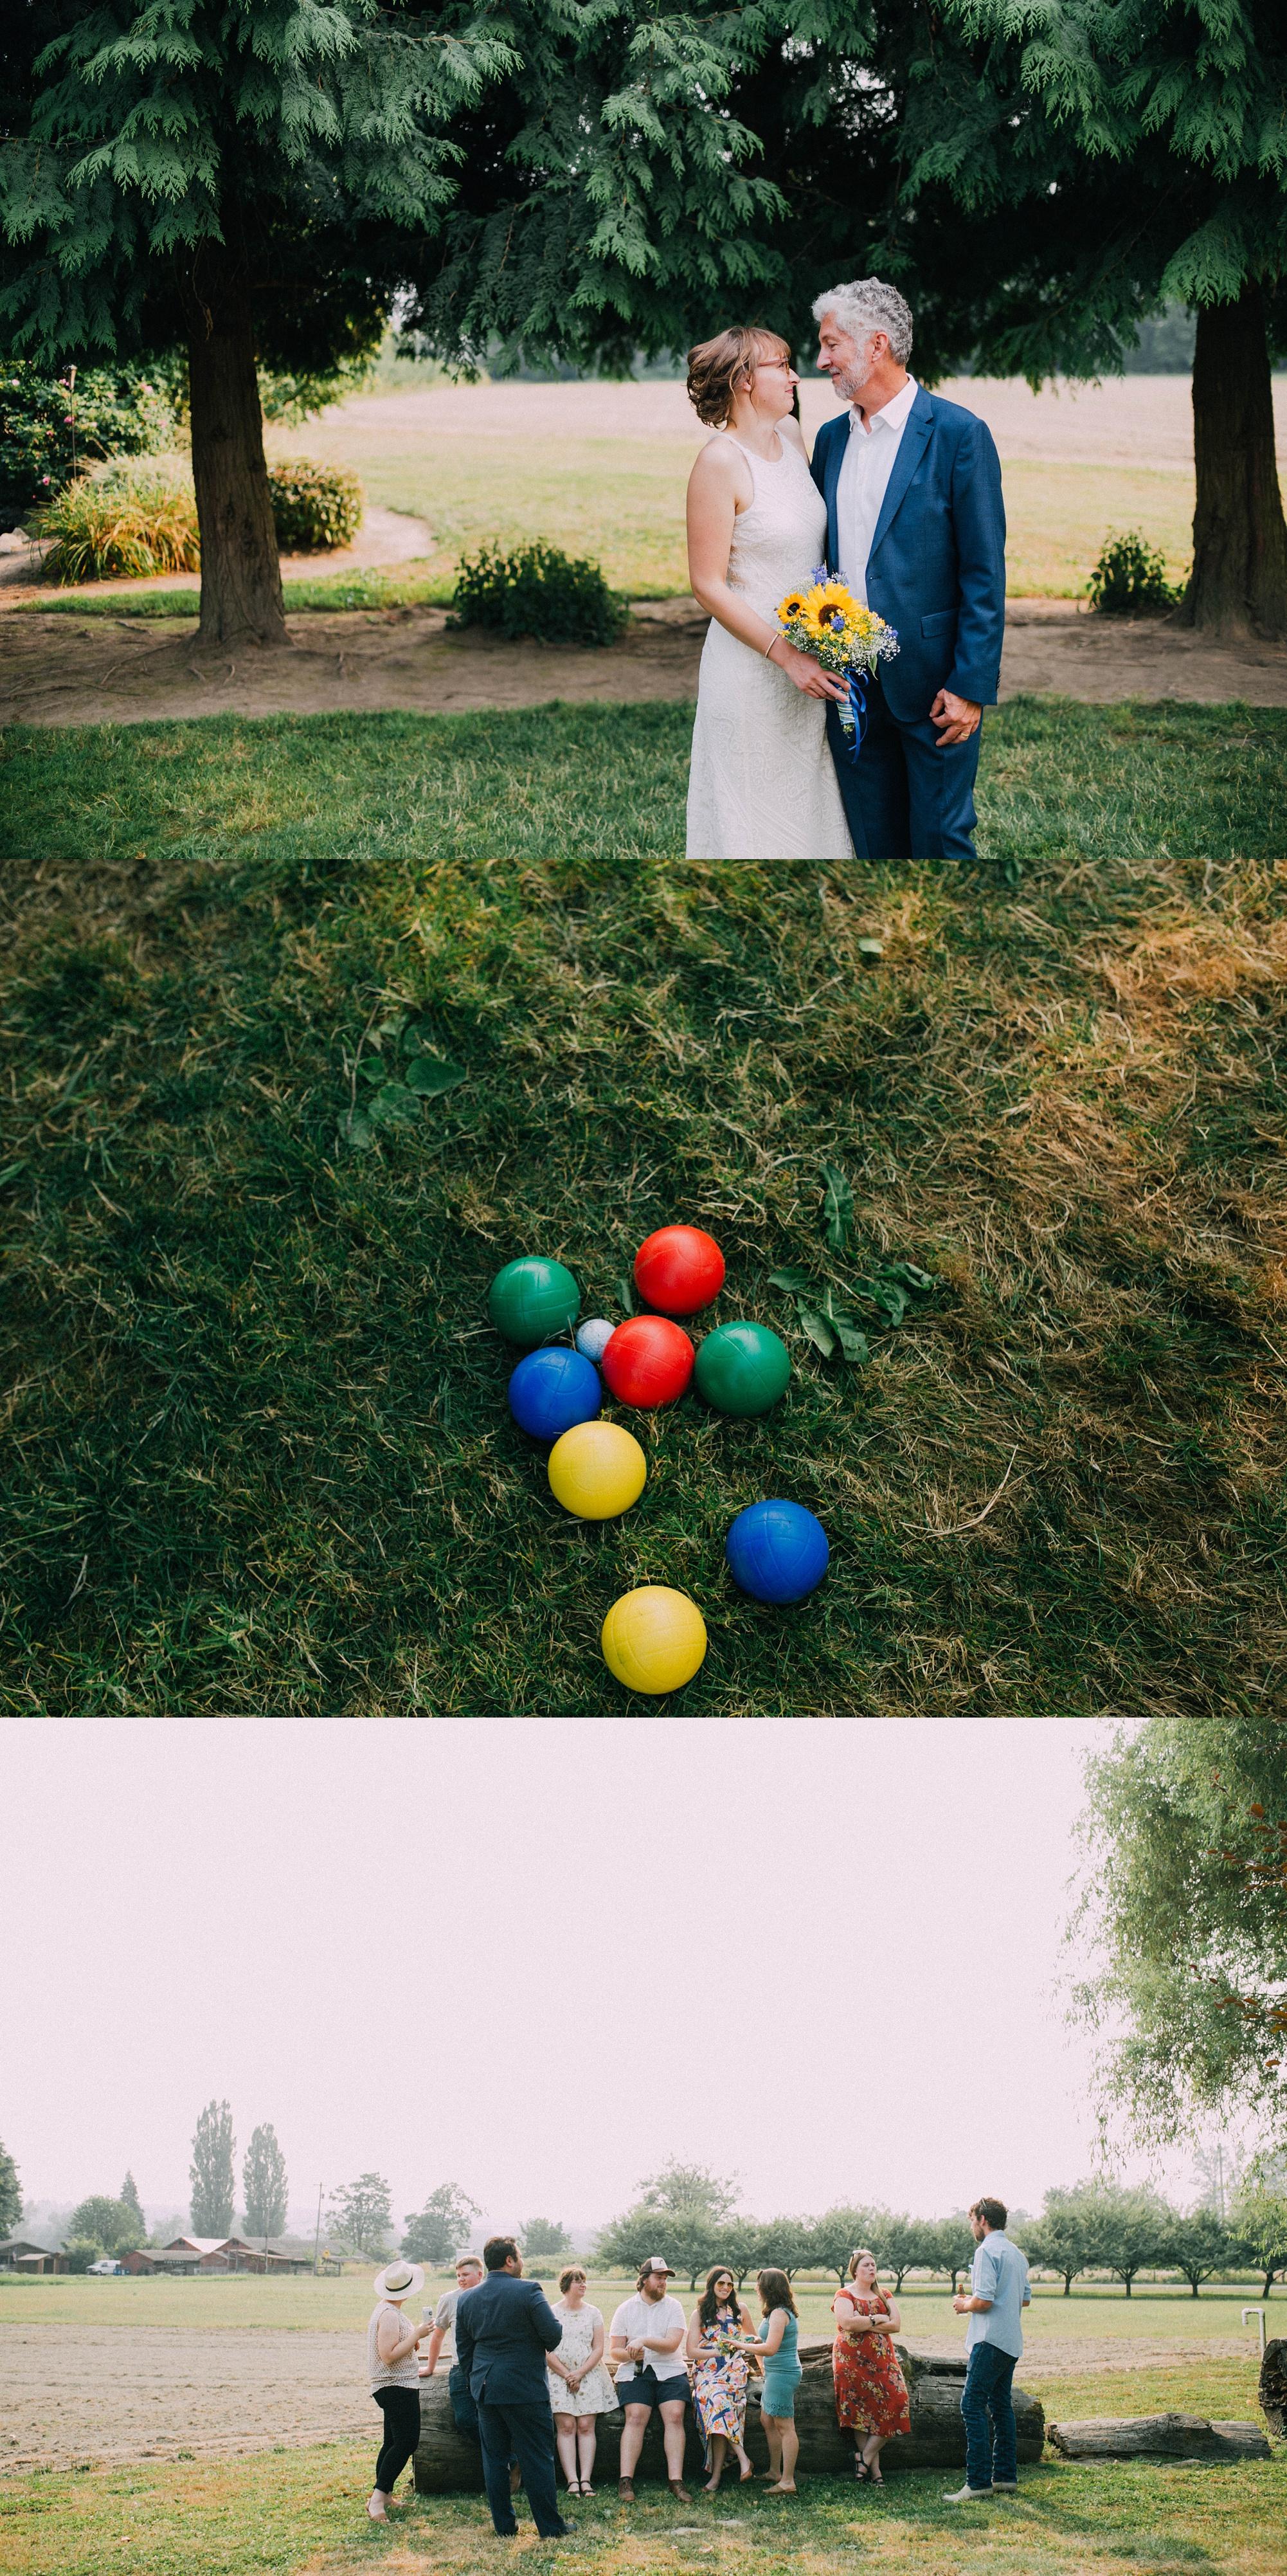 ashley_vos_seattle_ wedding_photographer_0469.jpg